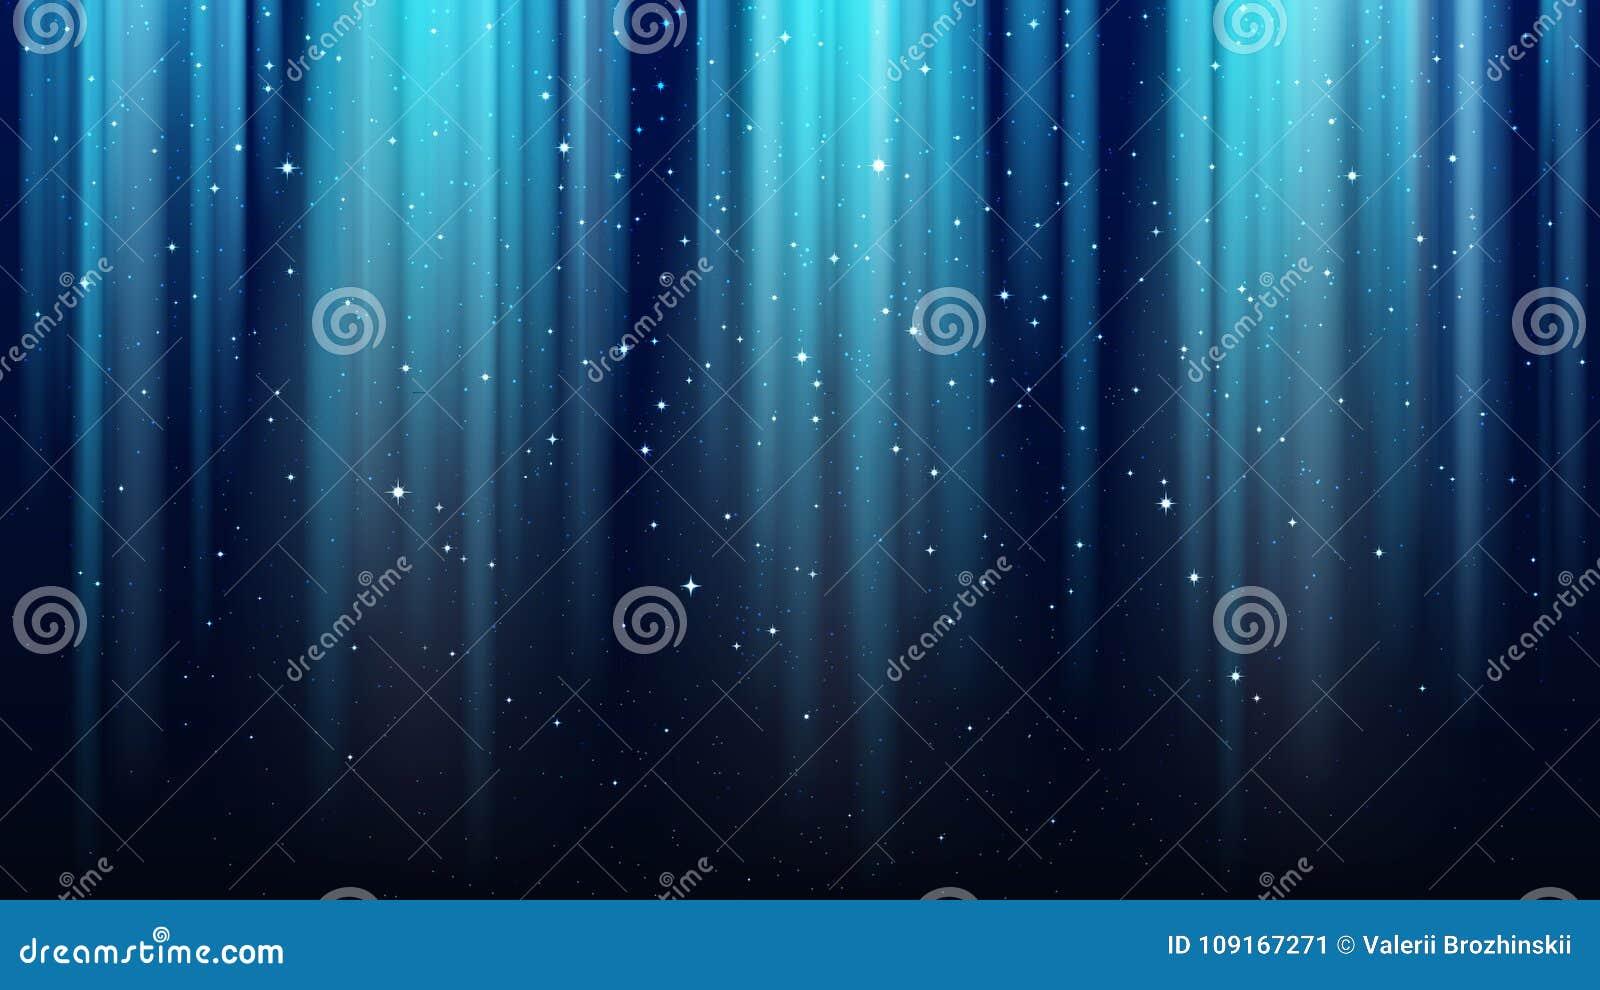 Empty dark blue background with rays of light, sparkles, shining night star sky